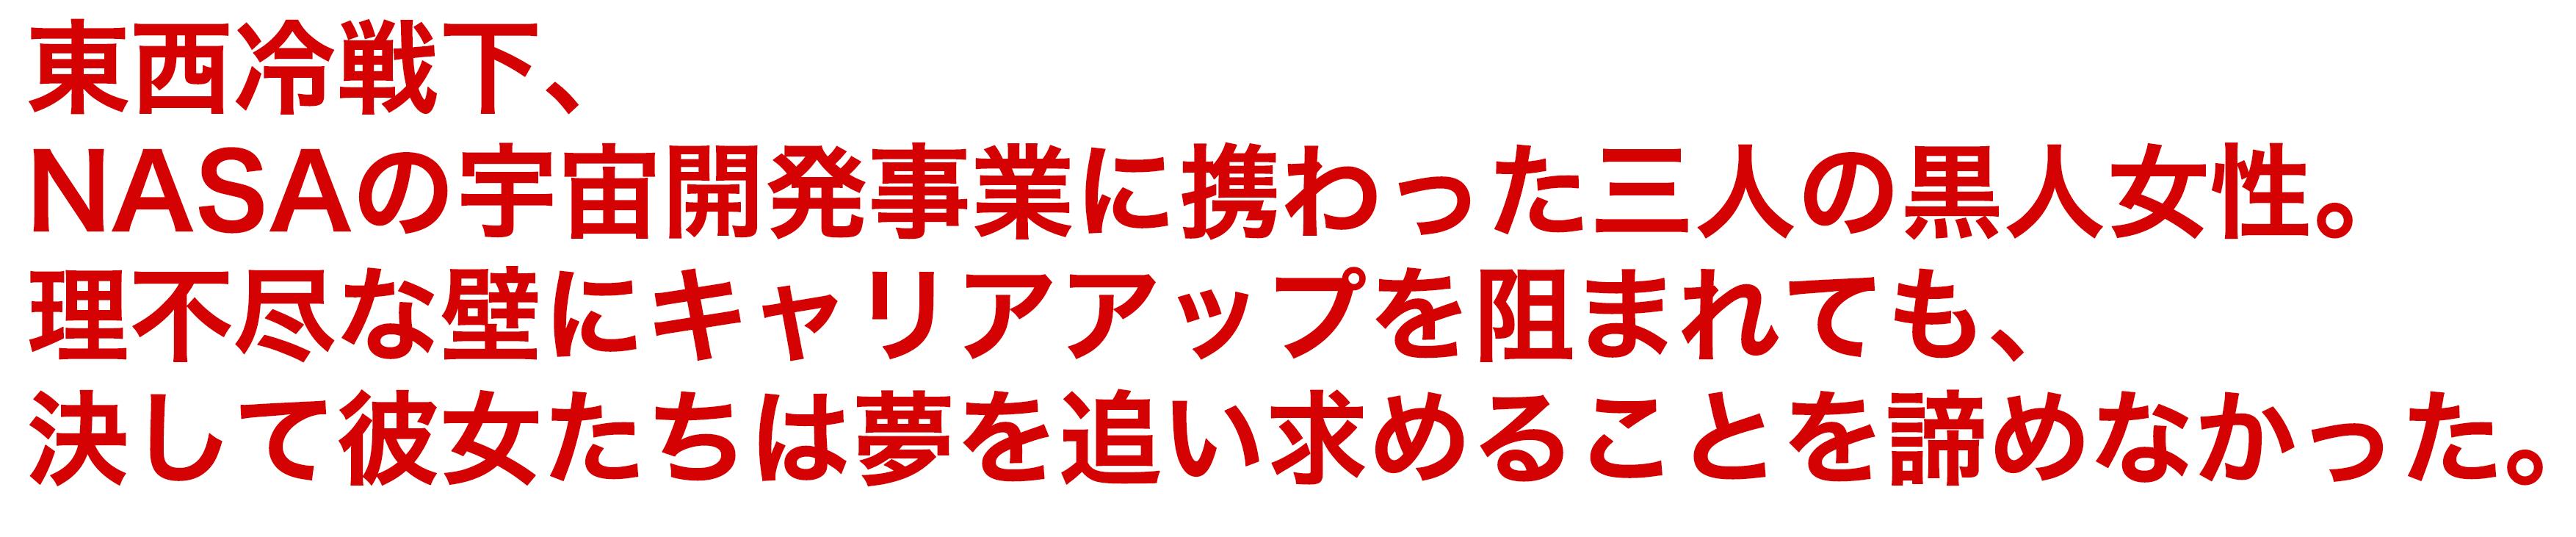 http://www.suncityhall.jp/%E3%83%89%E3%83%AA%E3%83%BC%E3%83%A0%E2%91%A6.jpg